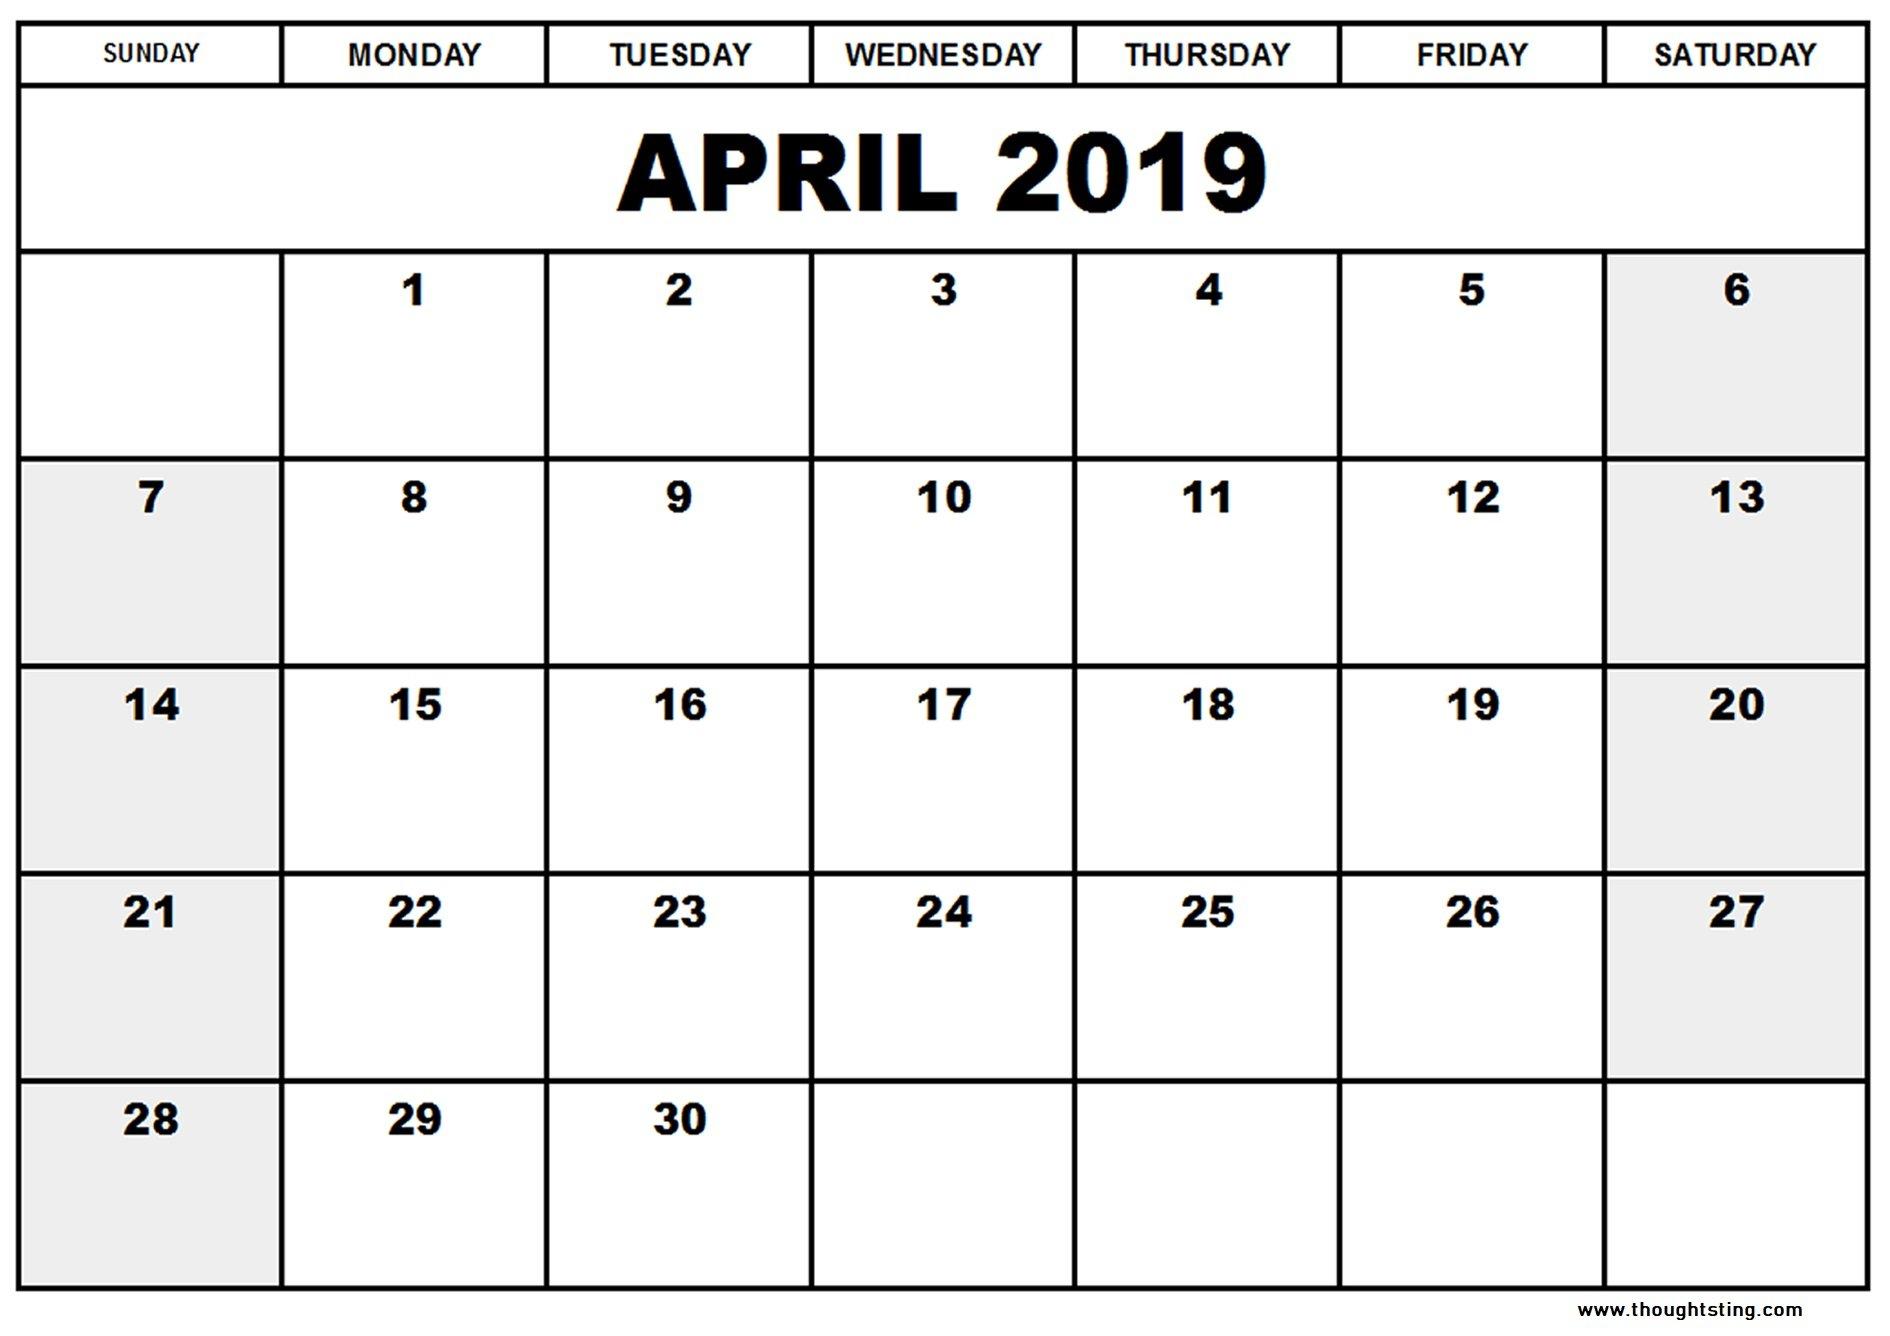 April 2019 Calendar Template Word, Excel, Pdf - Free Printable Calendar 2019 In Word